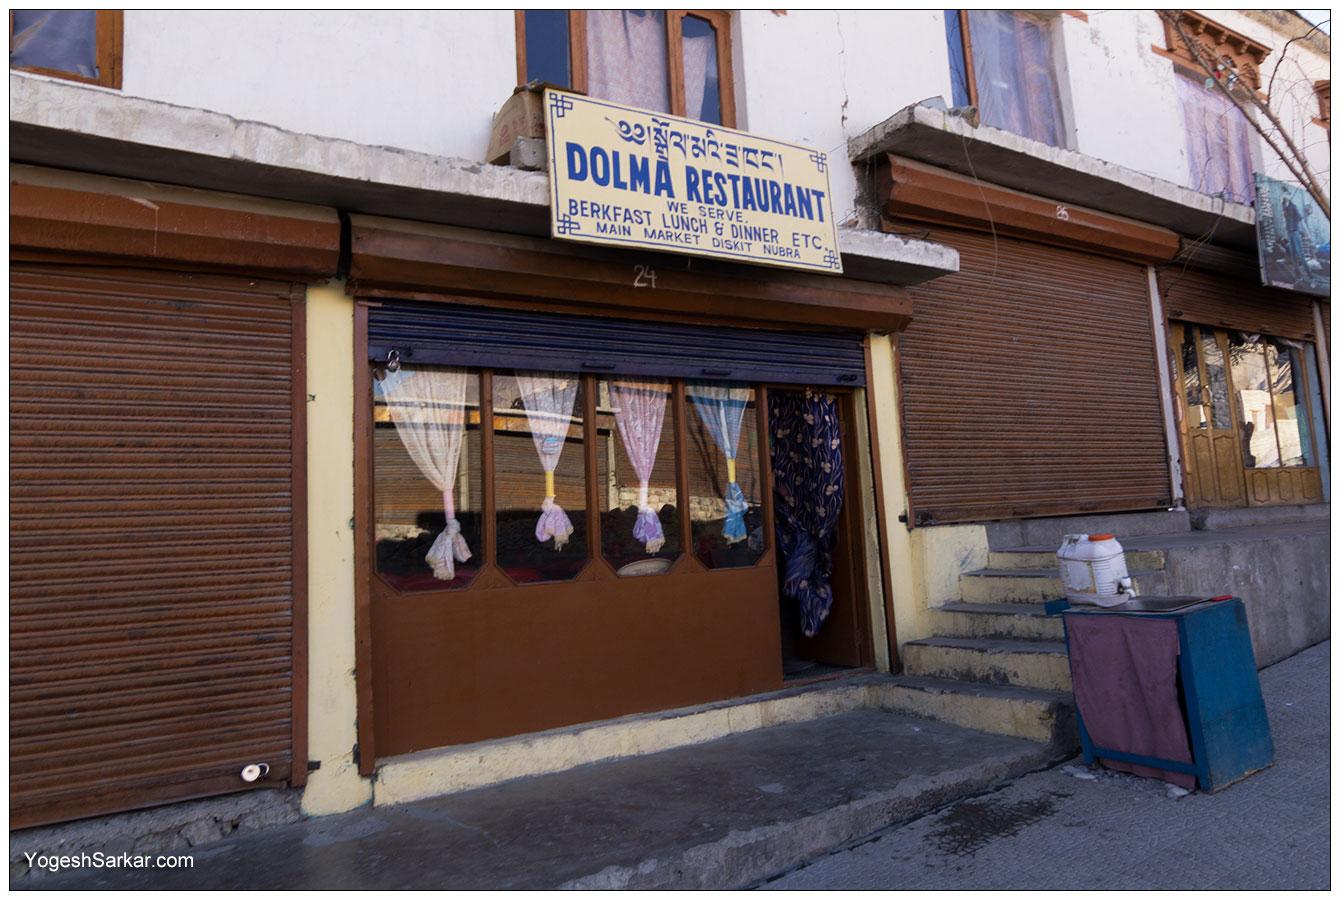 dolma-restaurant.jpg